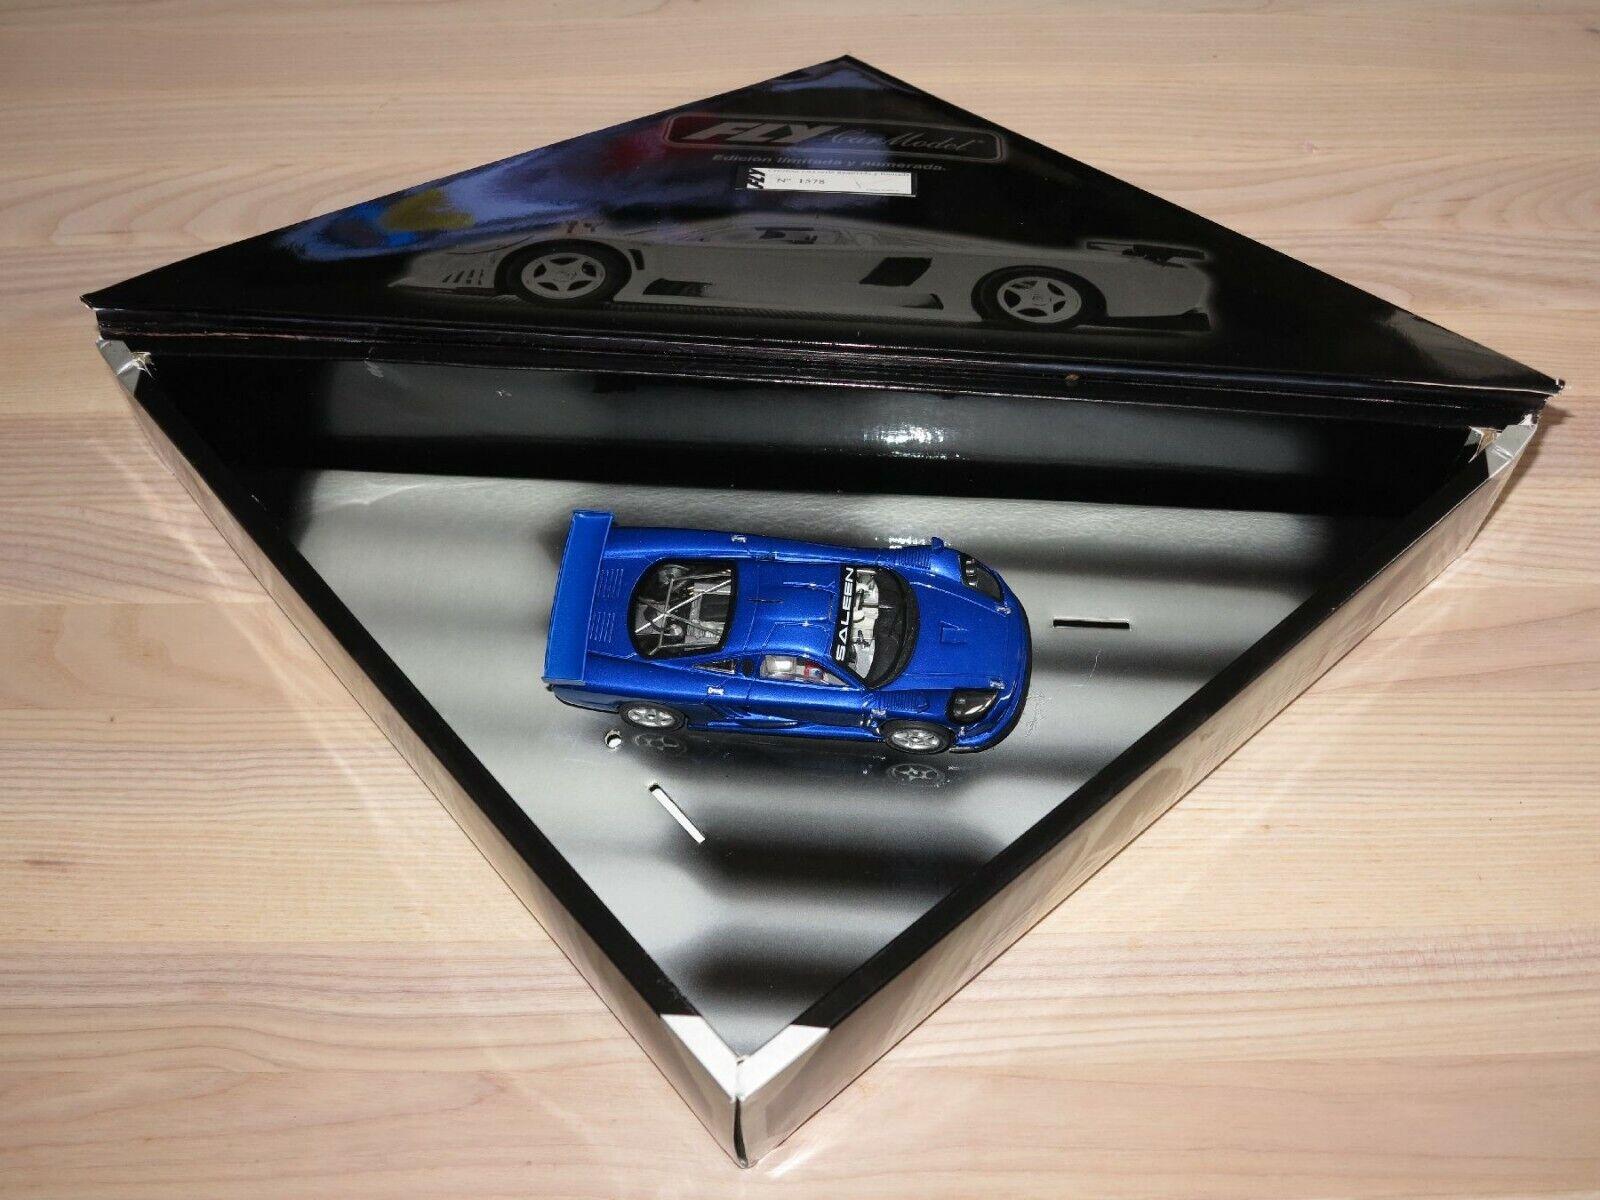 Fly Saleen S7r 1 3 2 Slotcar Limitato Box